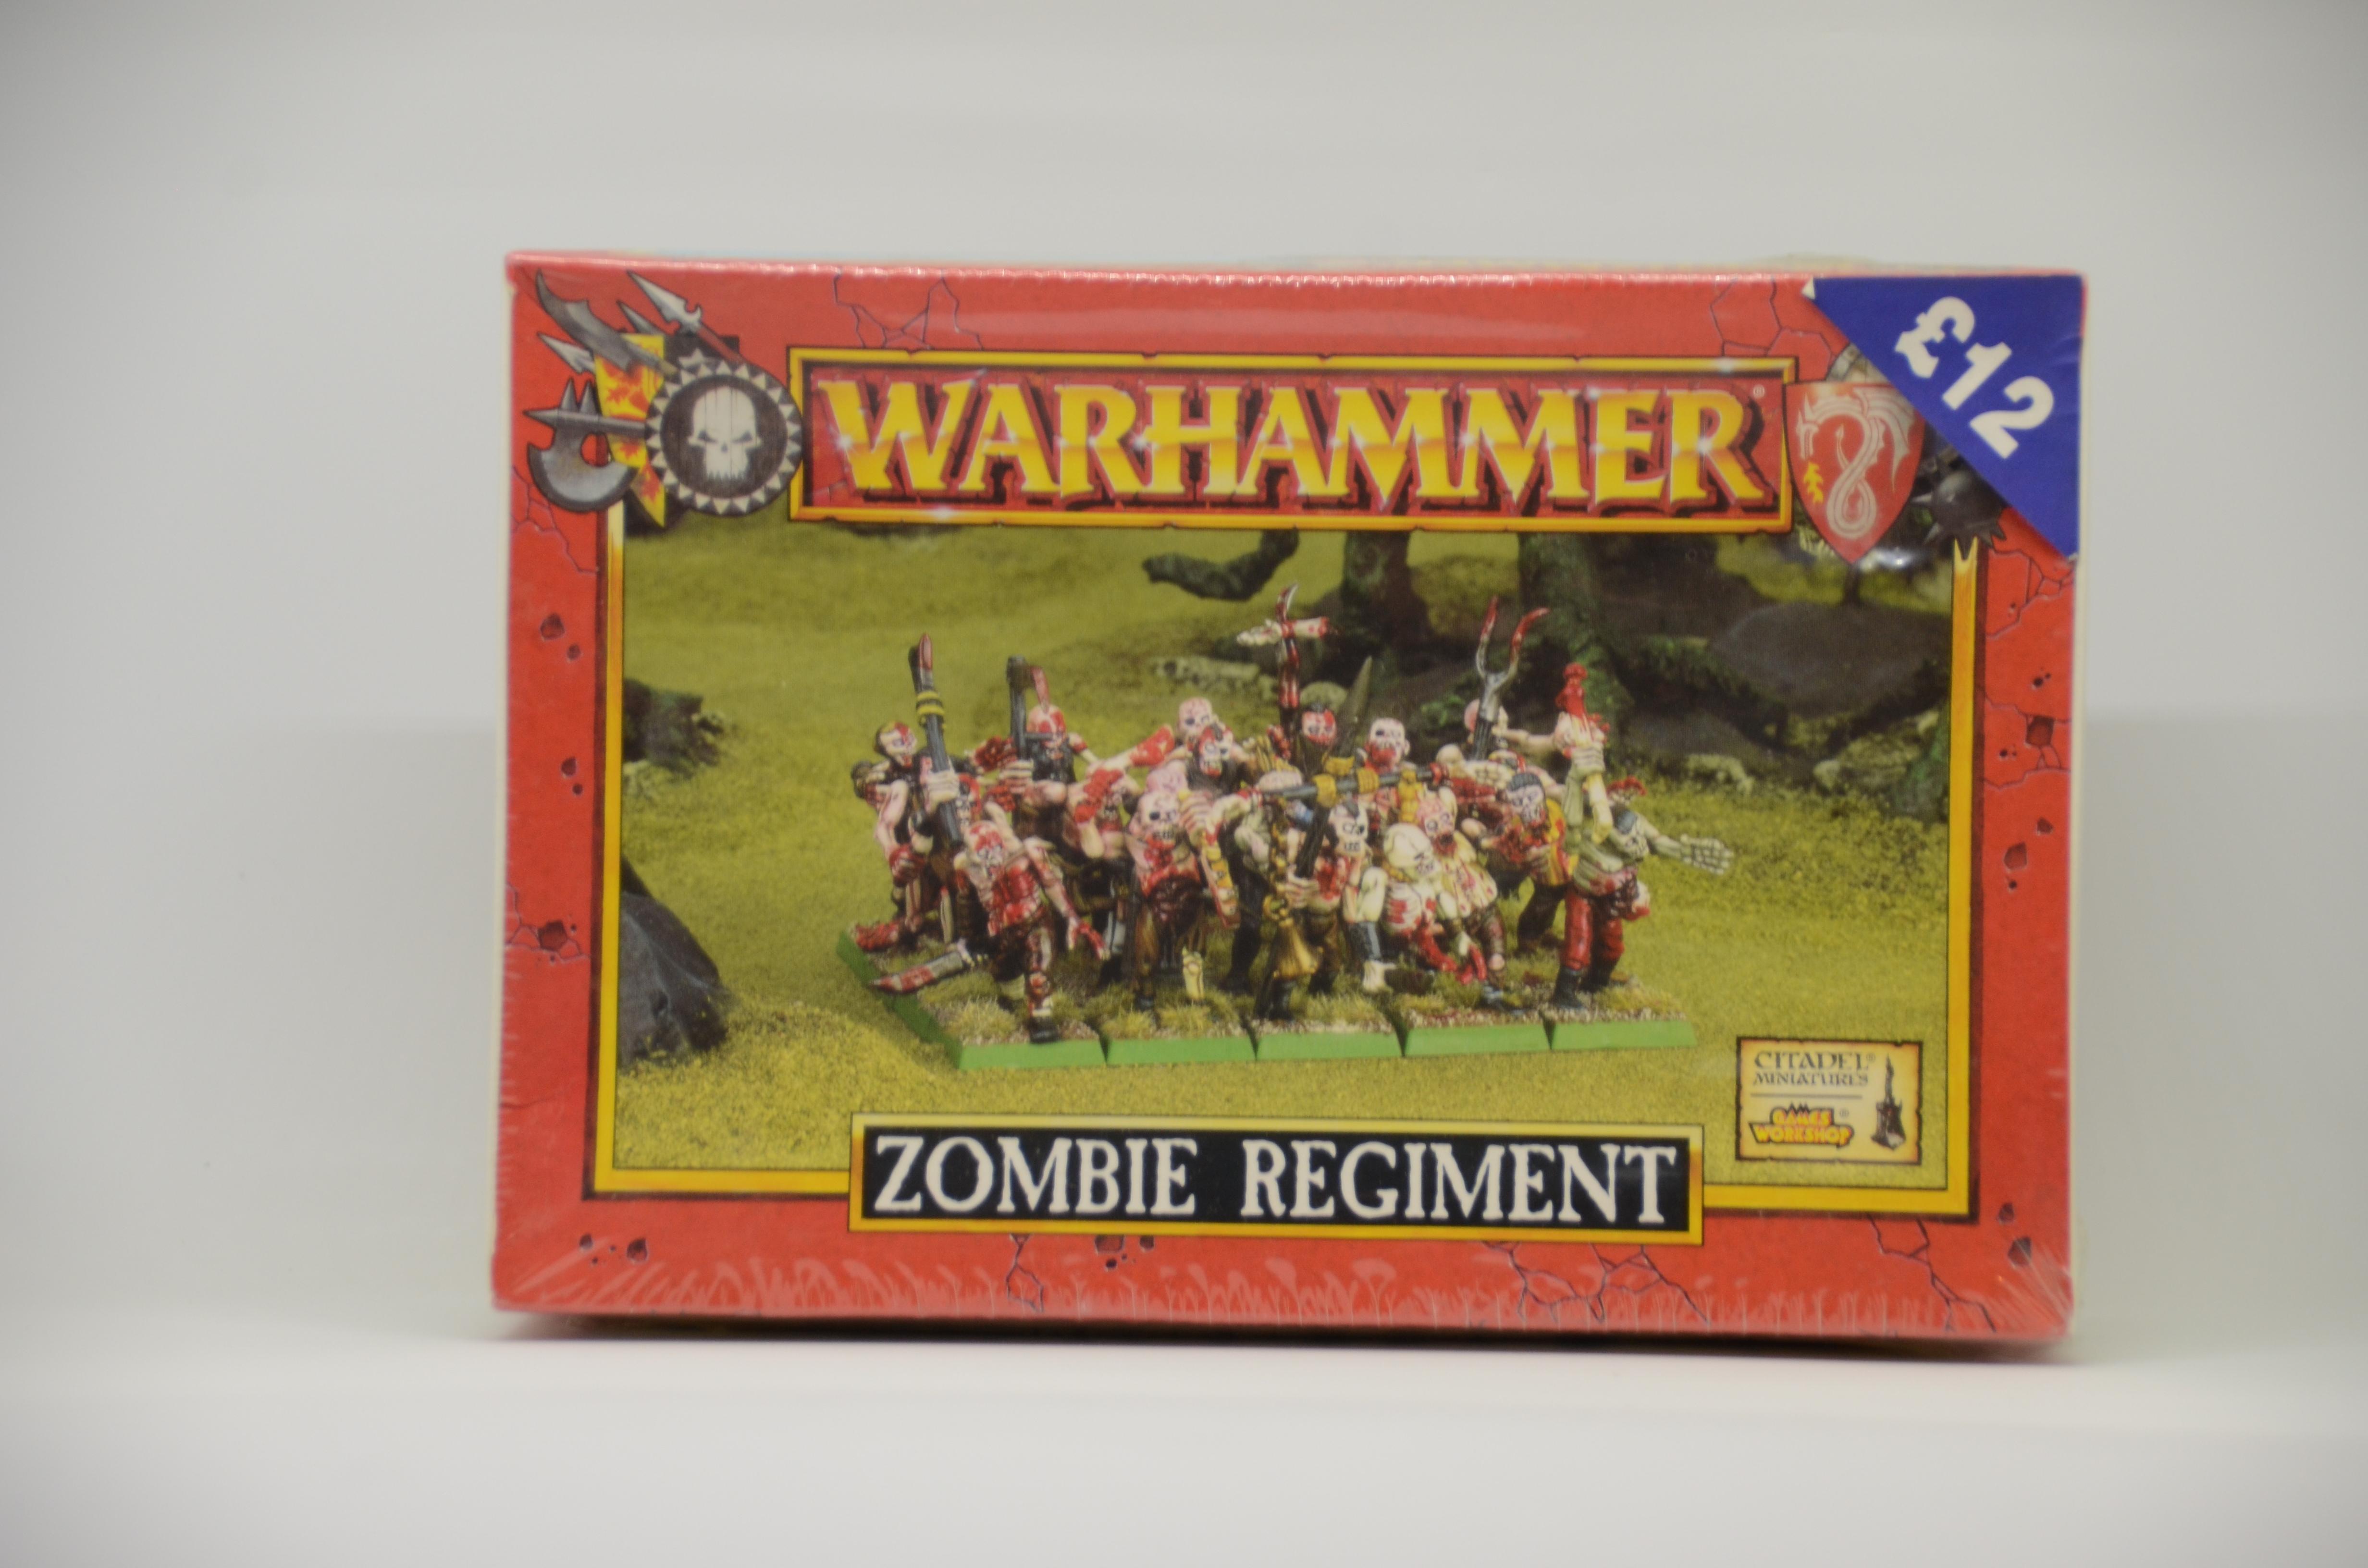 Zombie Regiment